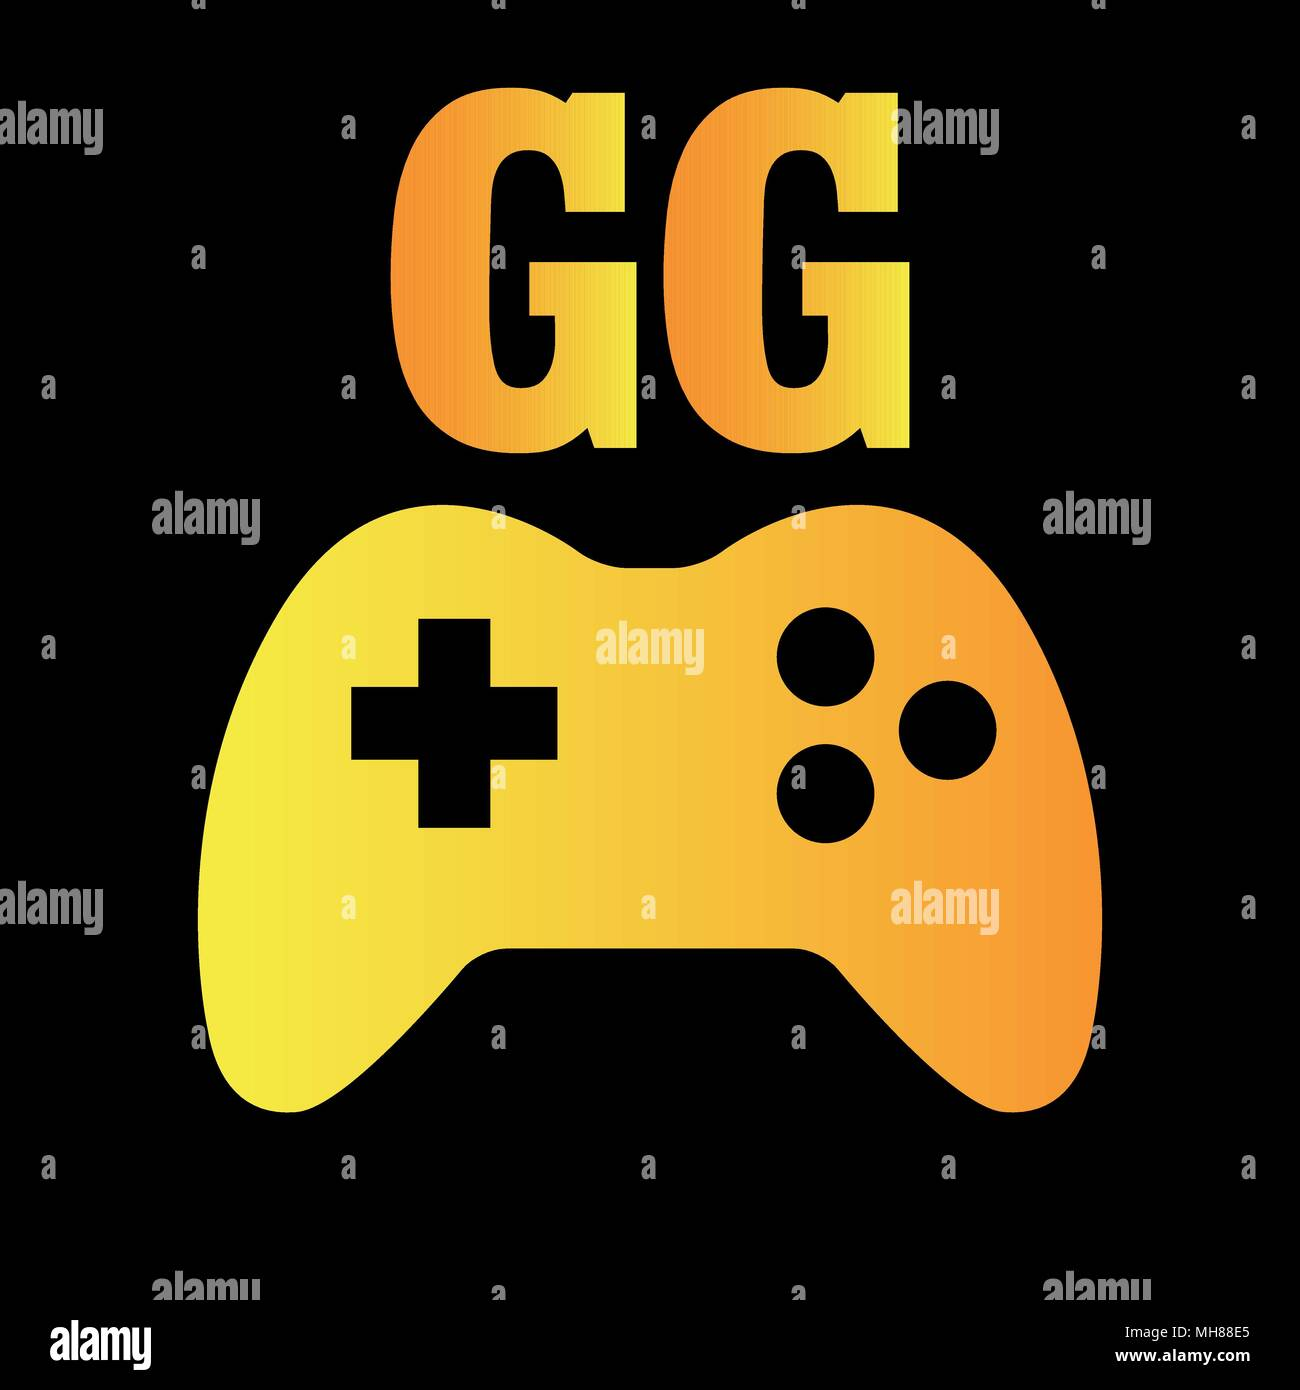 Logout Gg